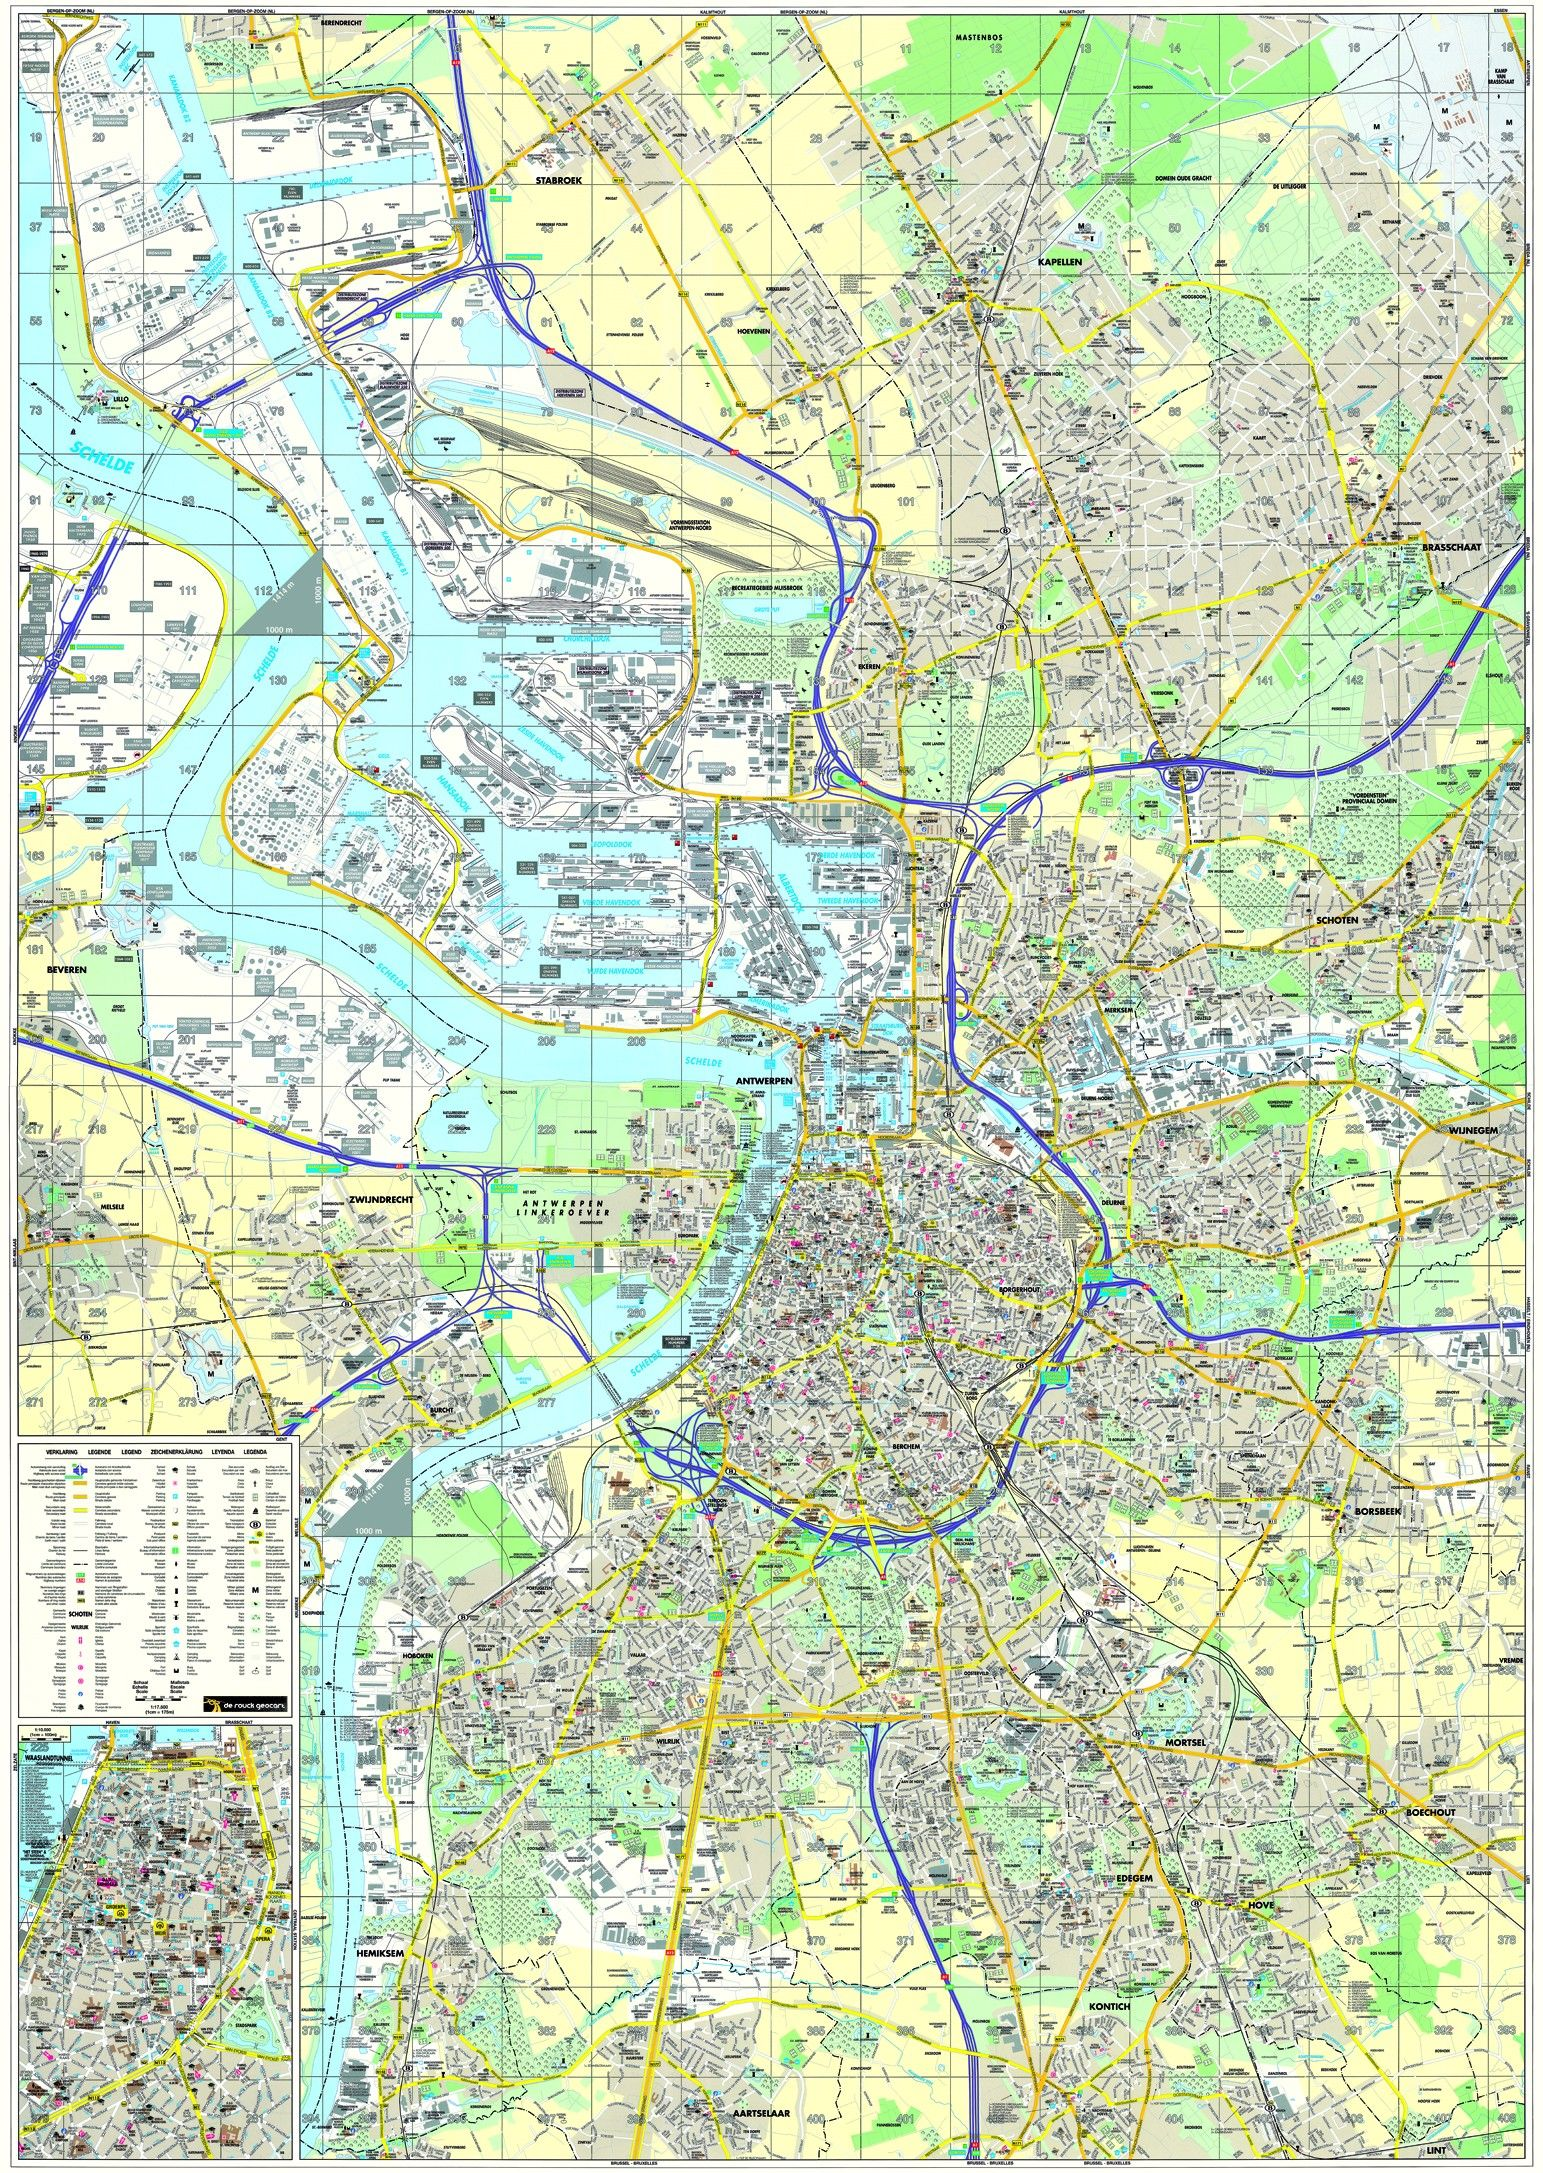 Stadsplattegrond Antwerpen 1:17.500